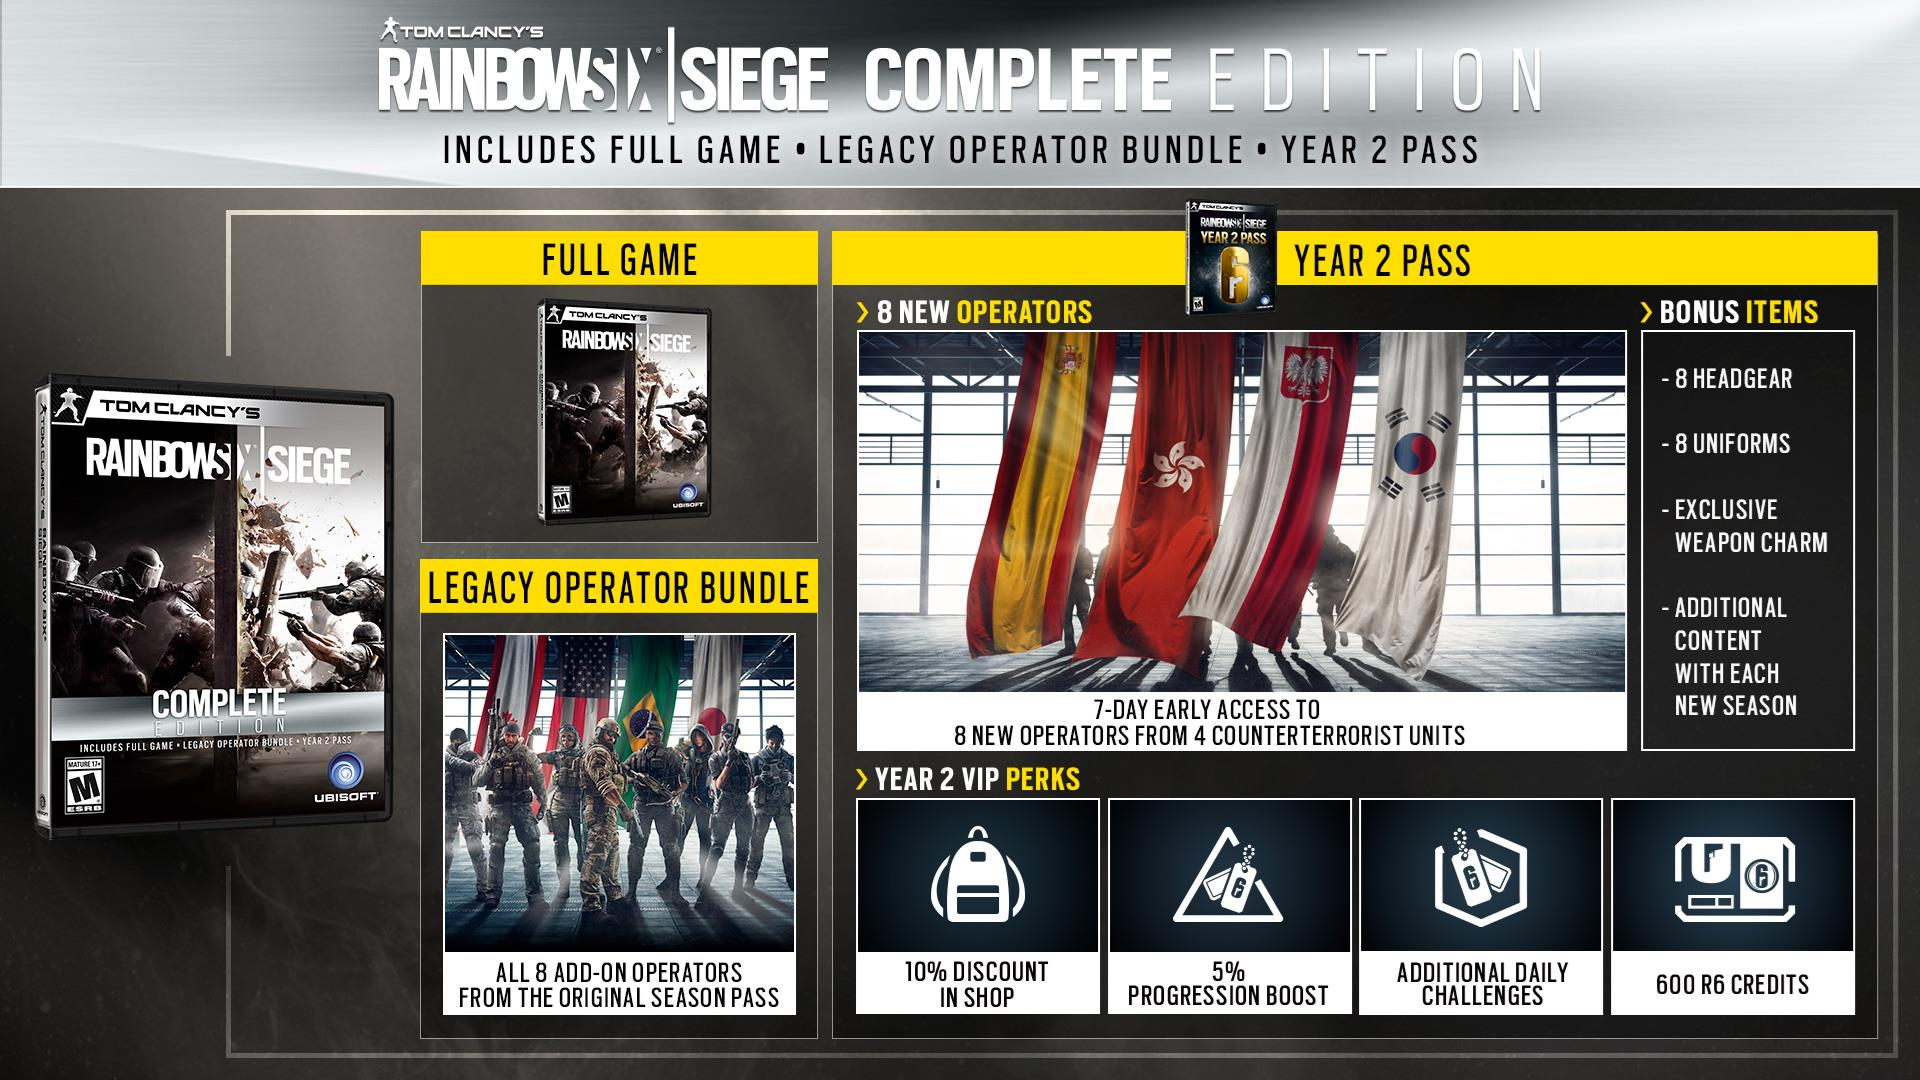 Rainbow Six Siege Year 2 roadmap revealed, includes